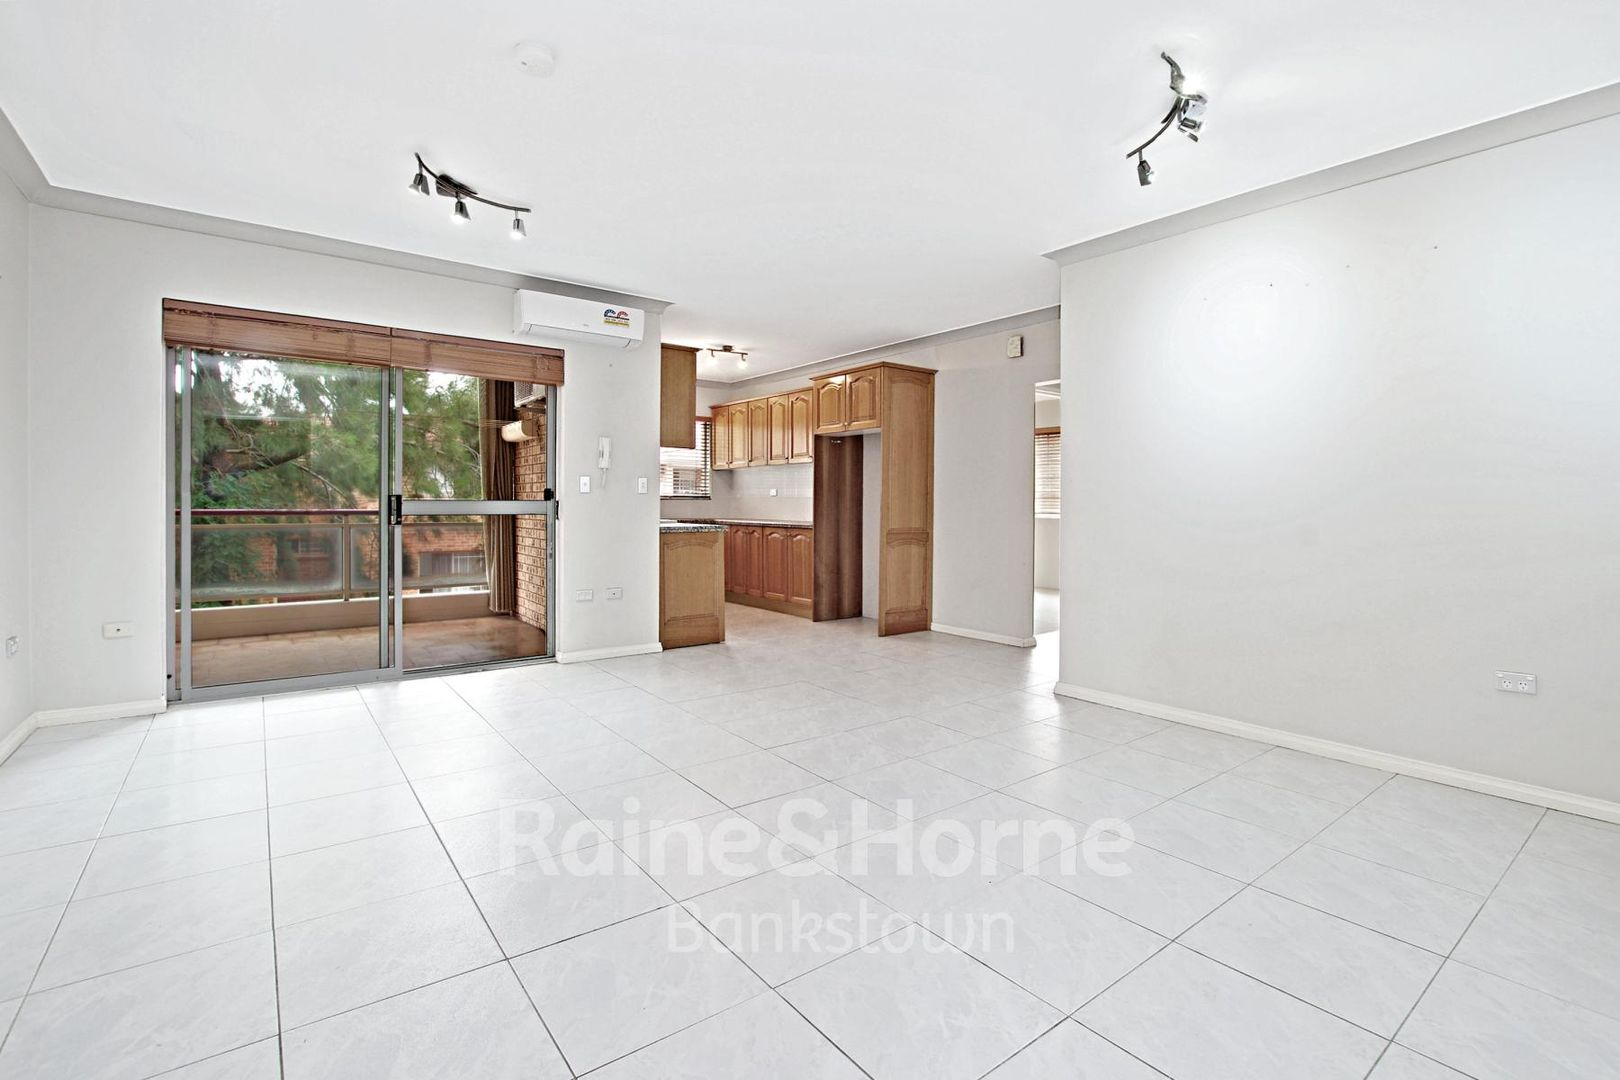 12/14 Gordon Street, Bankstown NSW 2200, Image 2